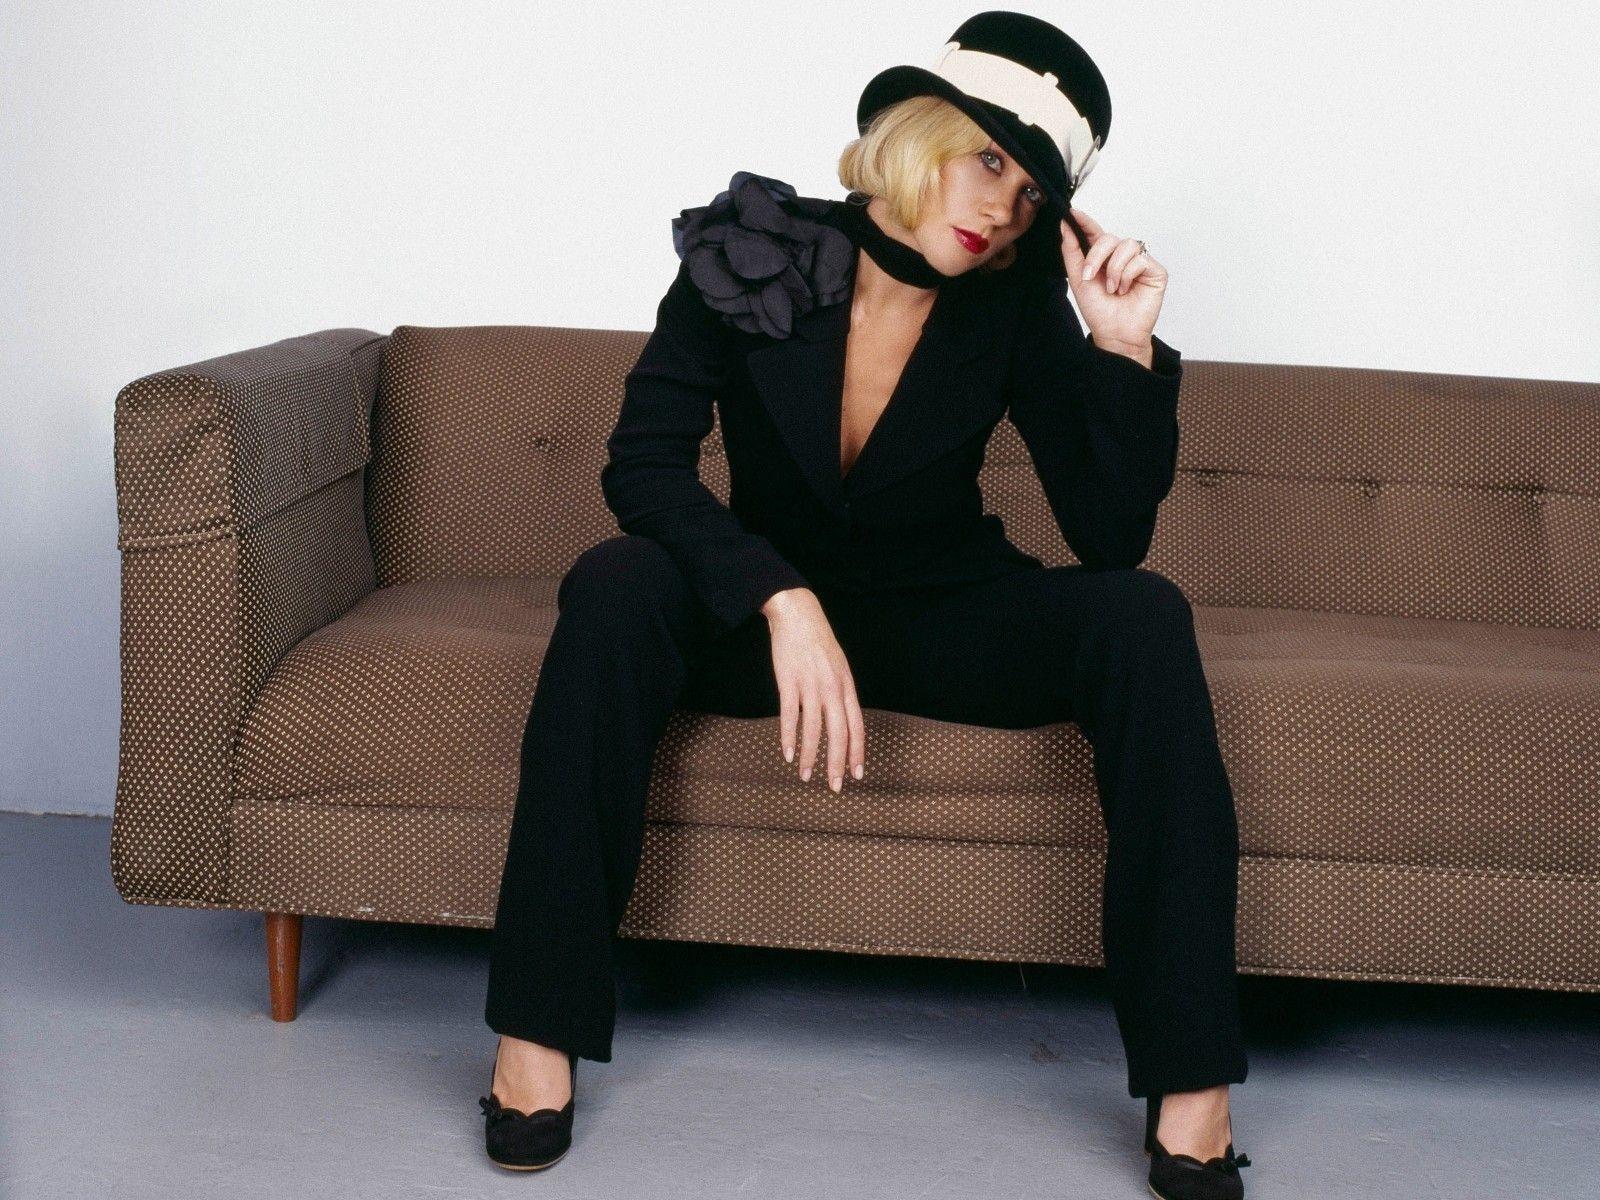 Wallpaper: una grintosa e sexy Christina Applegate